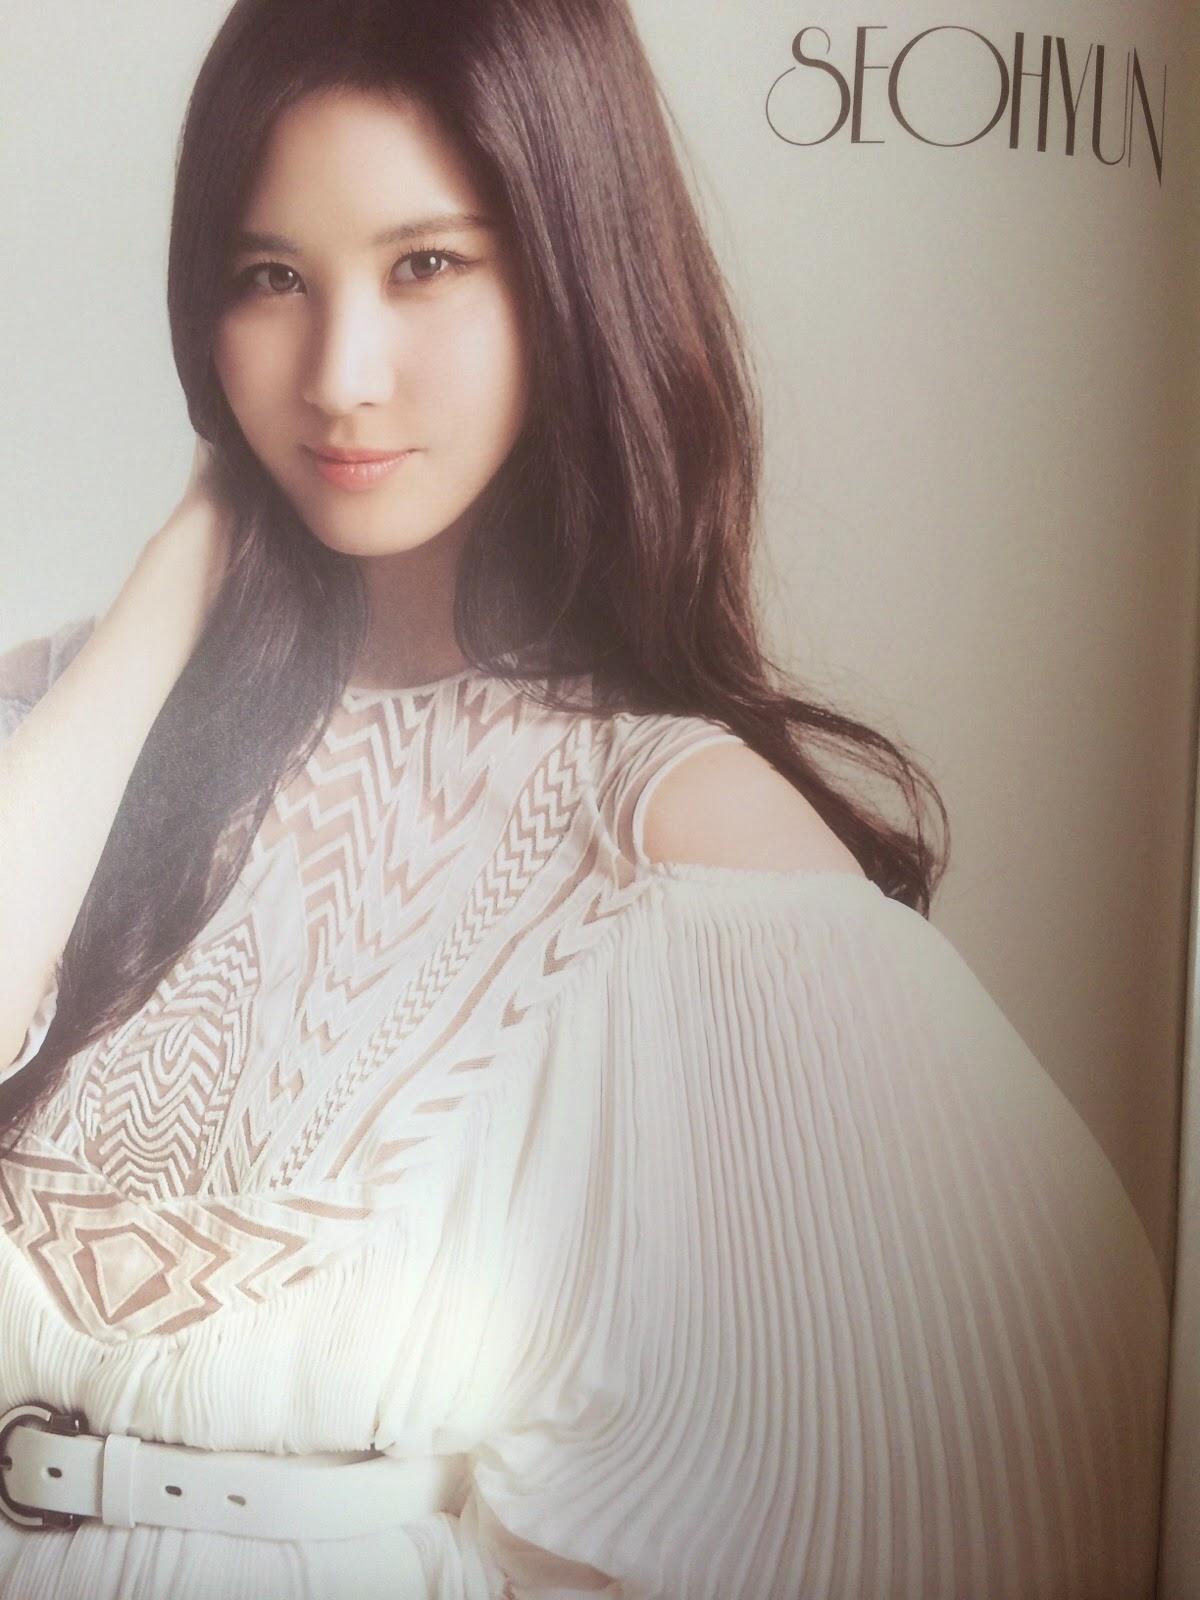 SNSD Sone Note 3 Seohyun